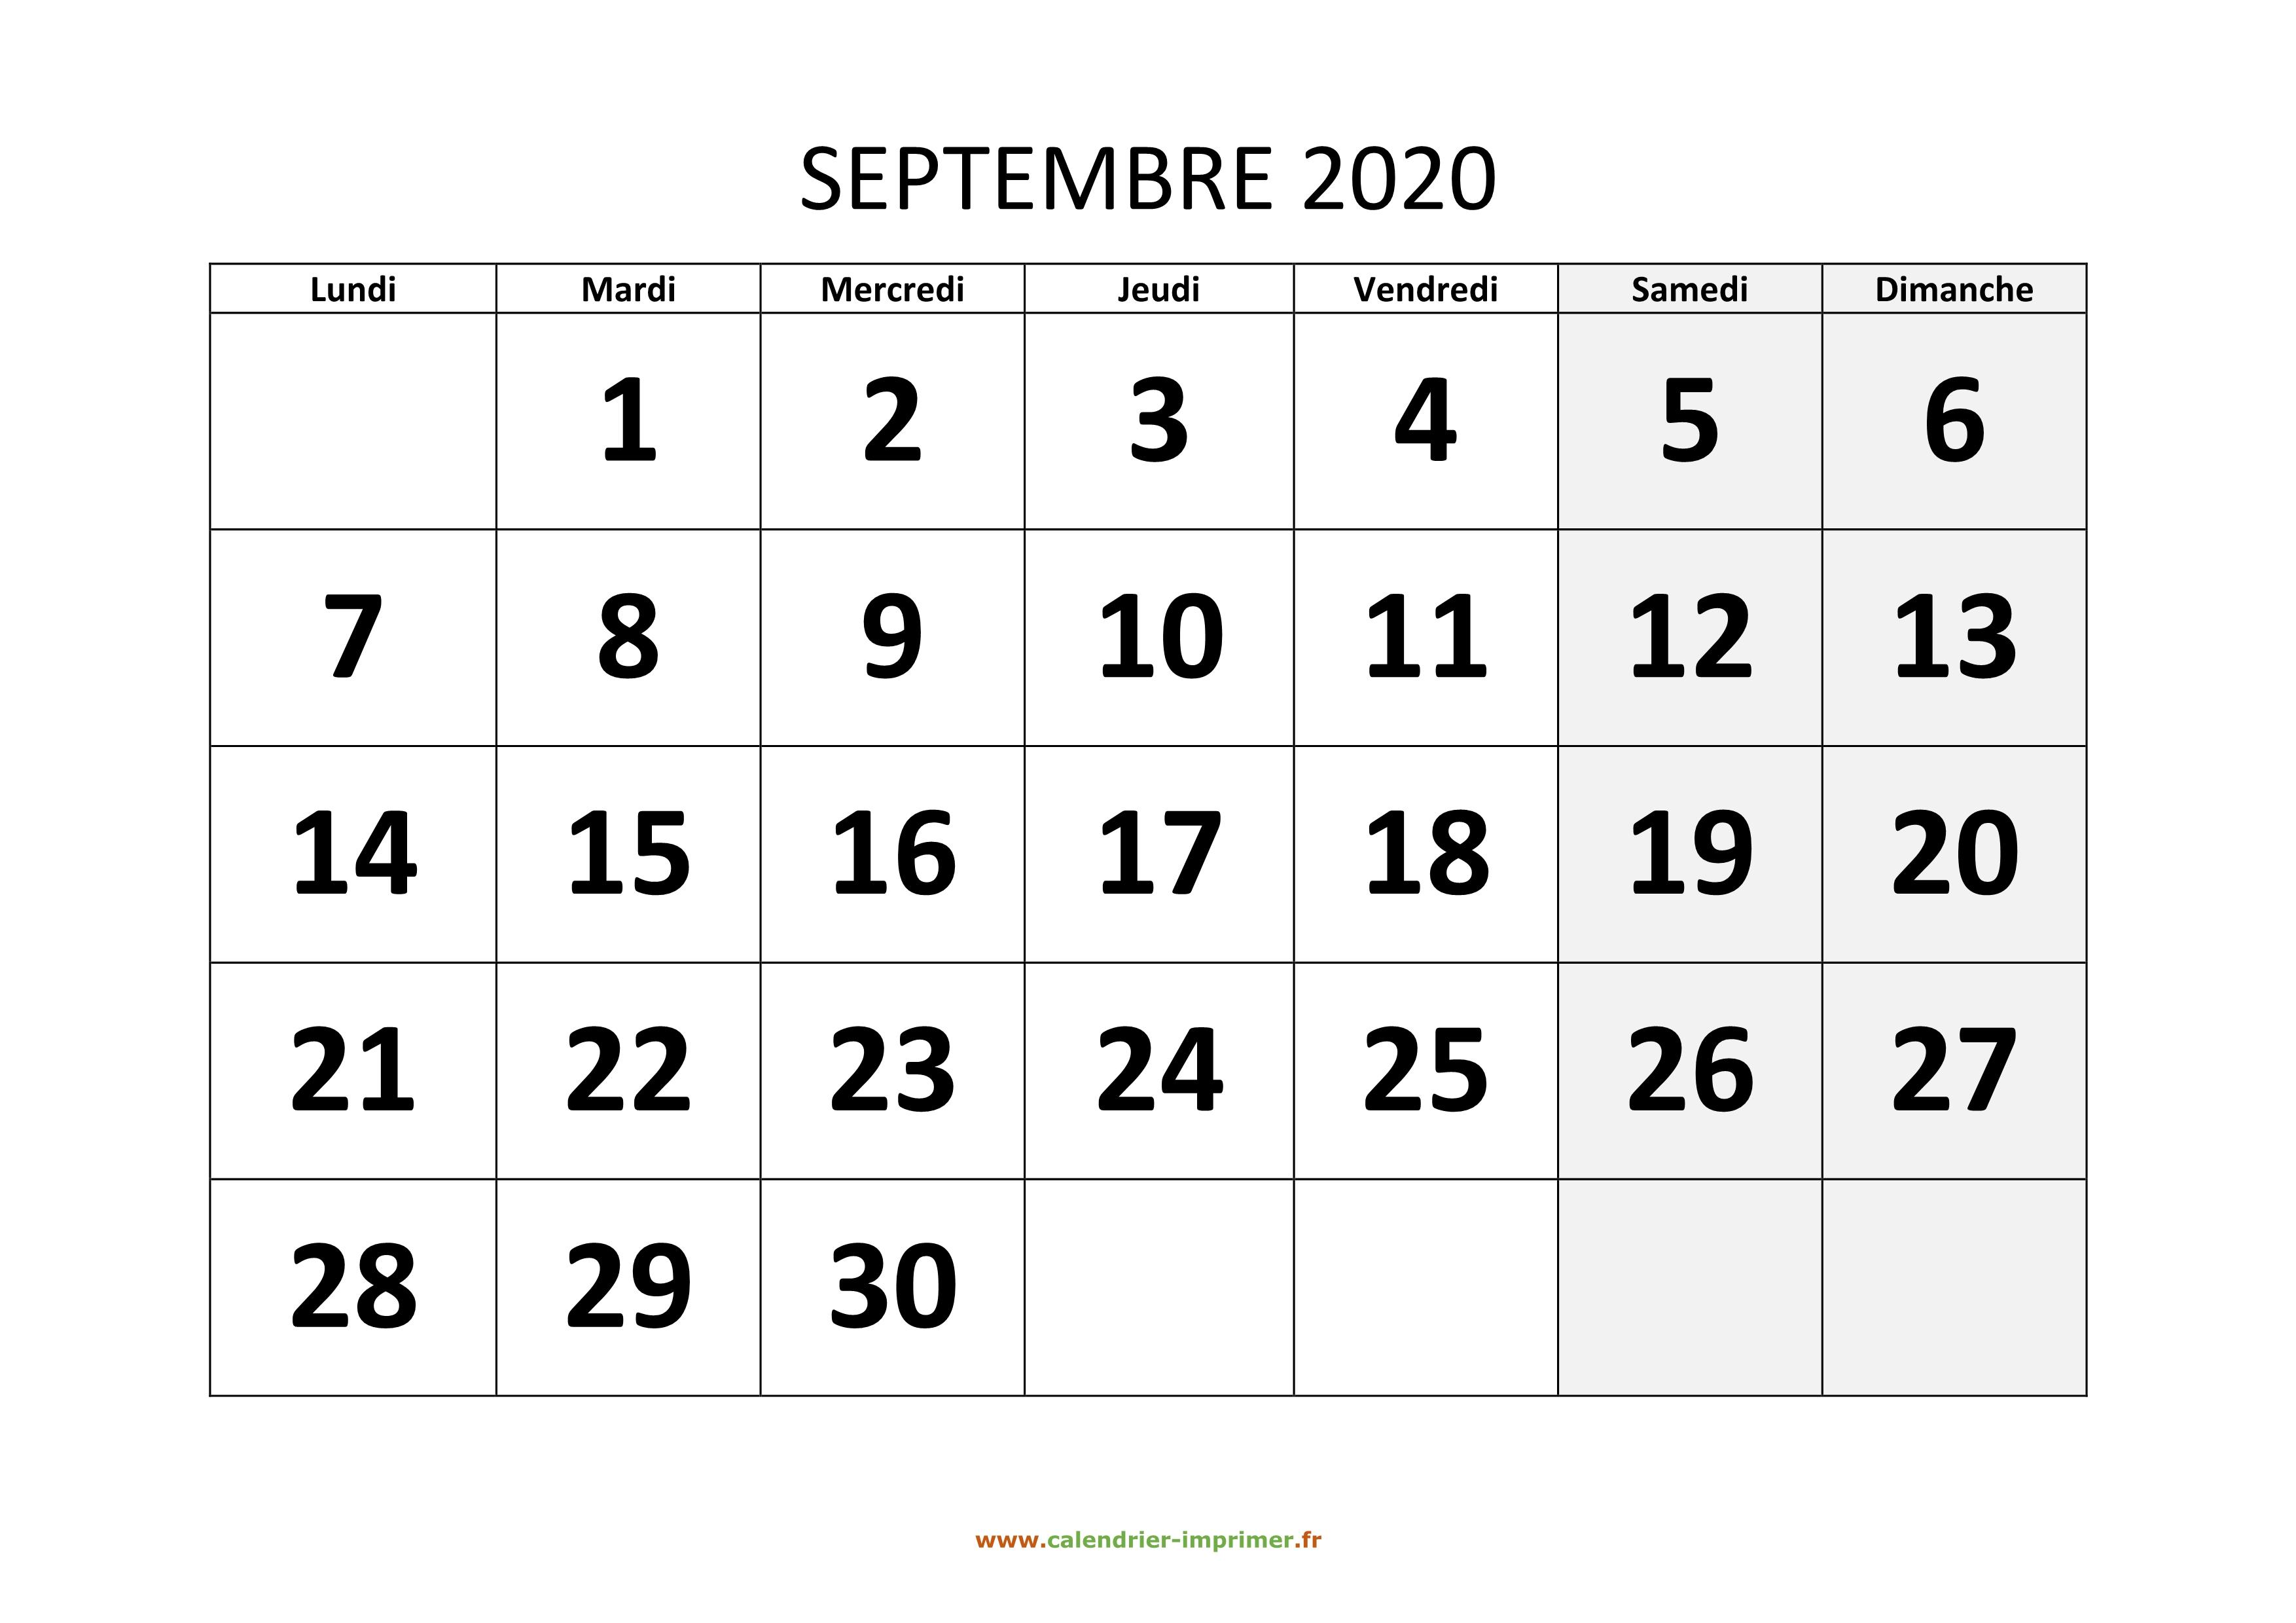 Calendrier Septembre 2020.Calendrier Septembre 2020 A Imprimer